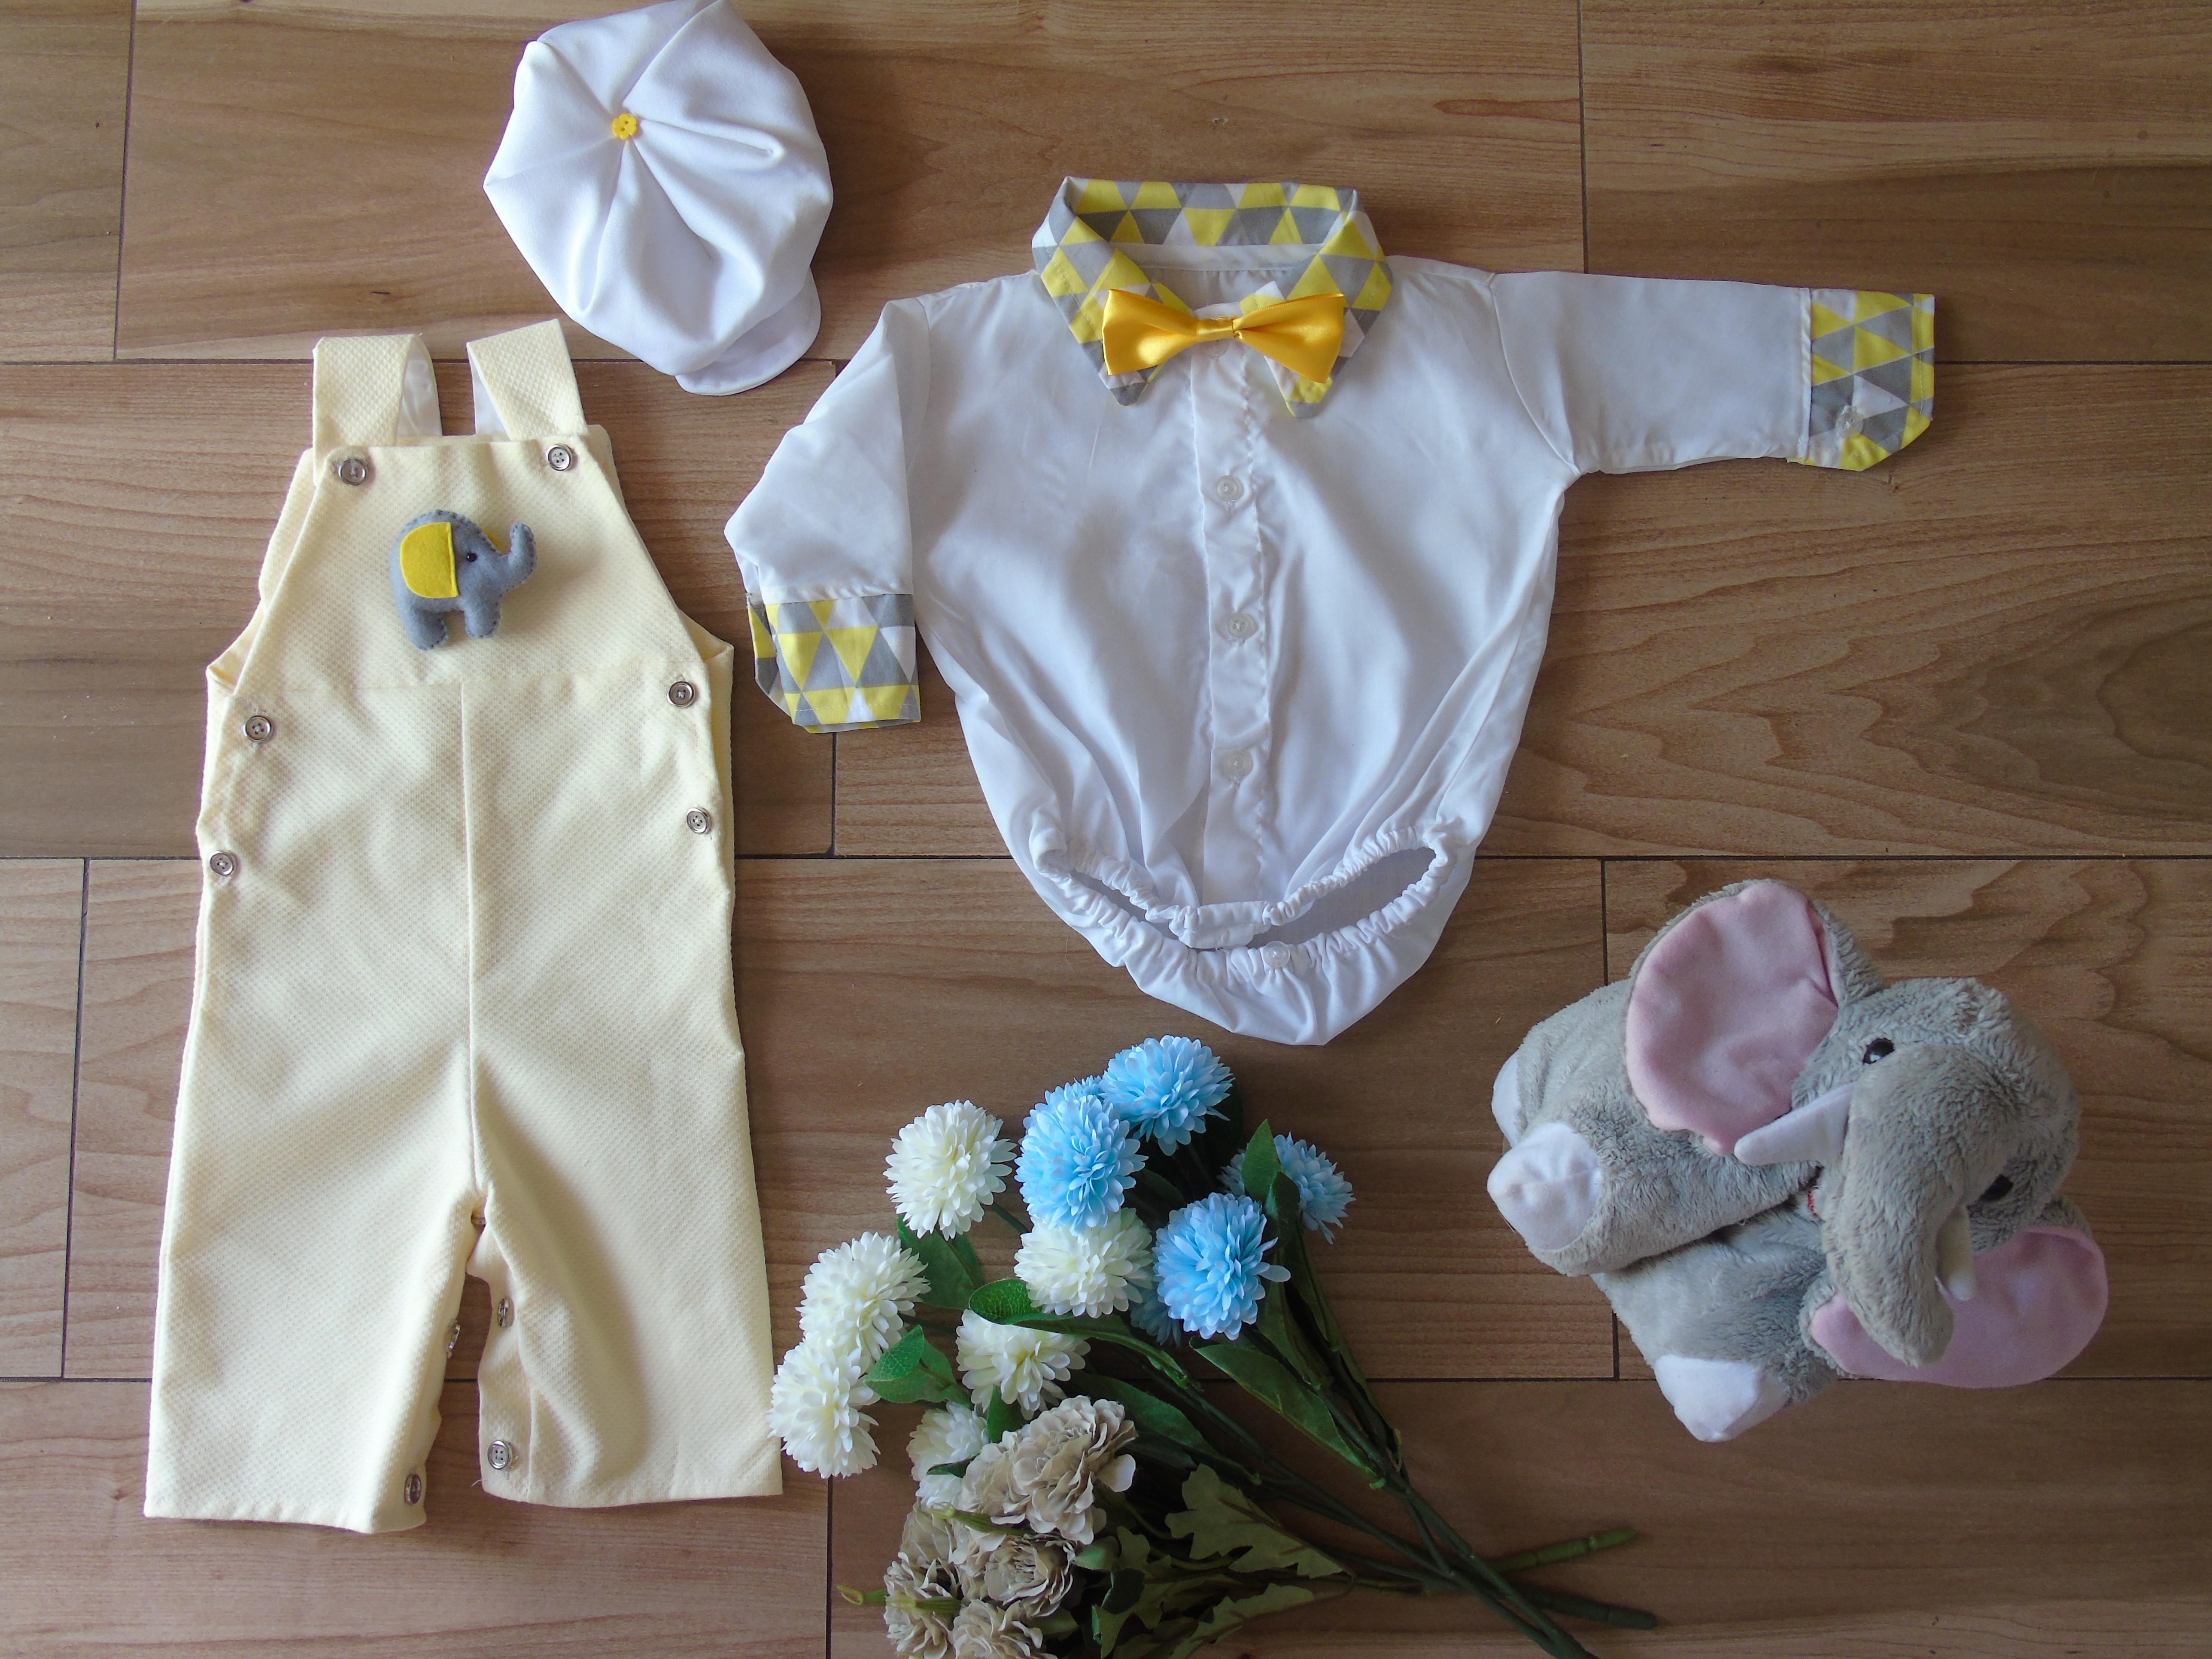 Saída de Maternidade Roupa de Maternidade Roupa de Bebê Roupa Infantil  d29ef17e2dceb